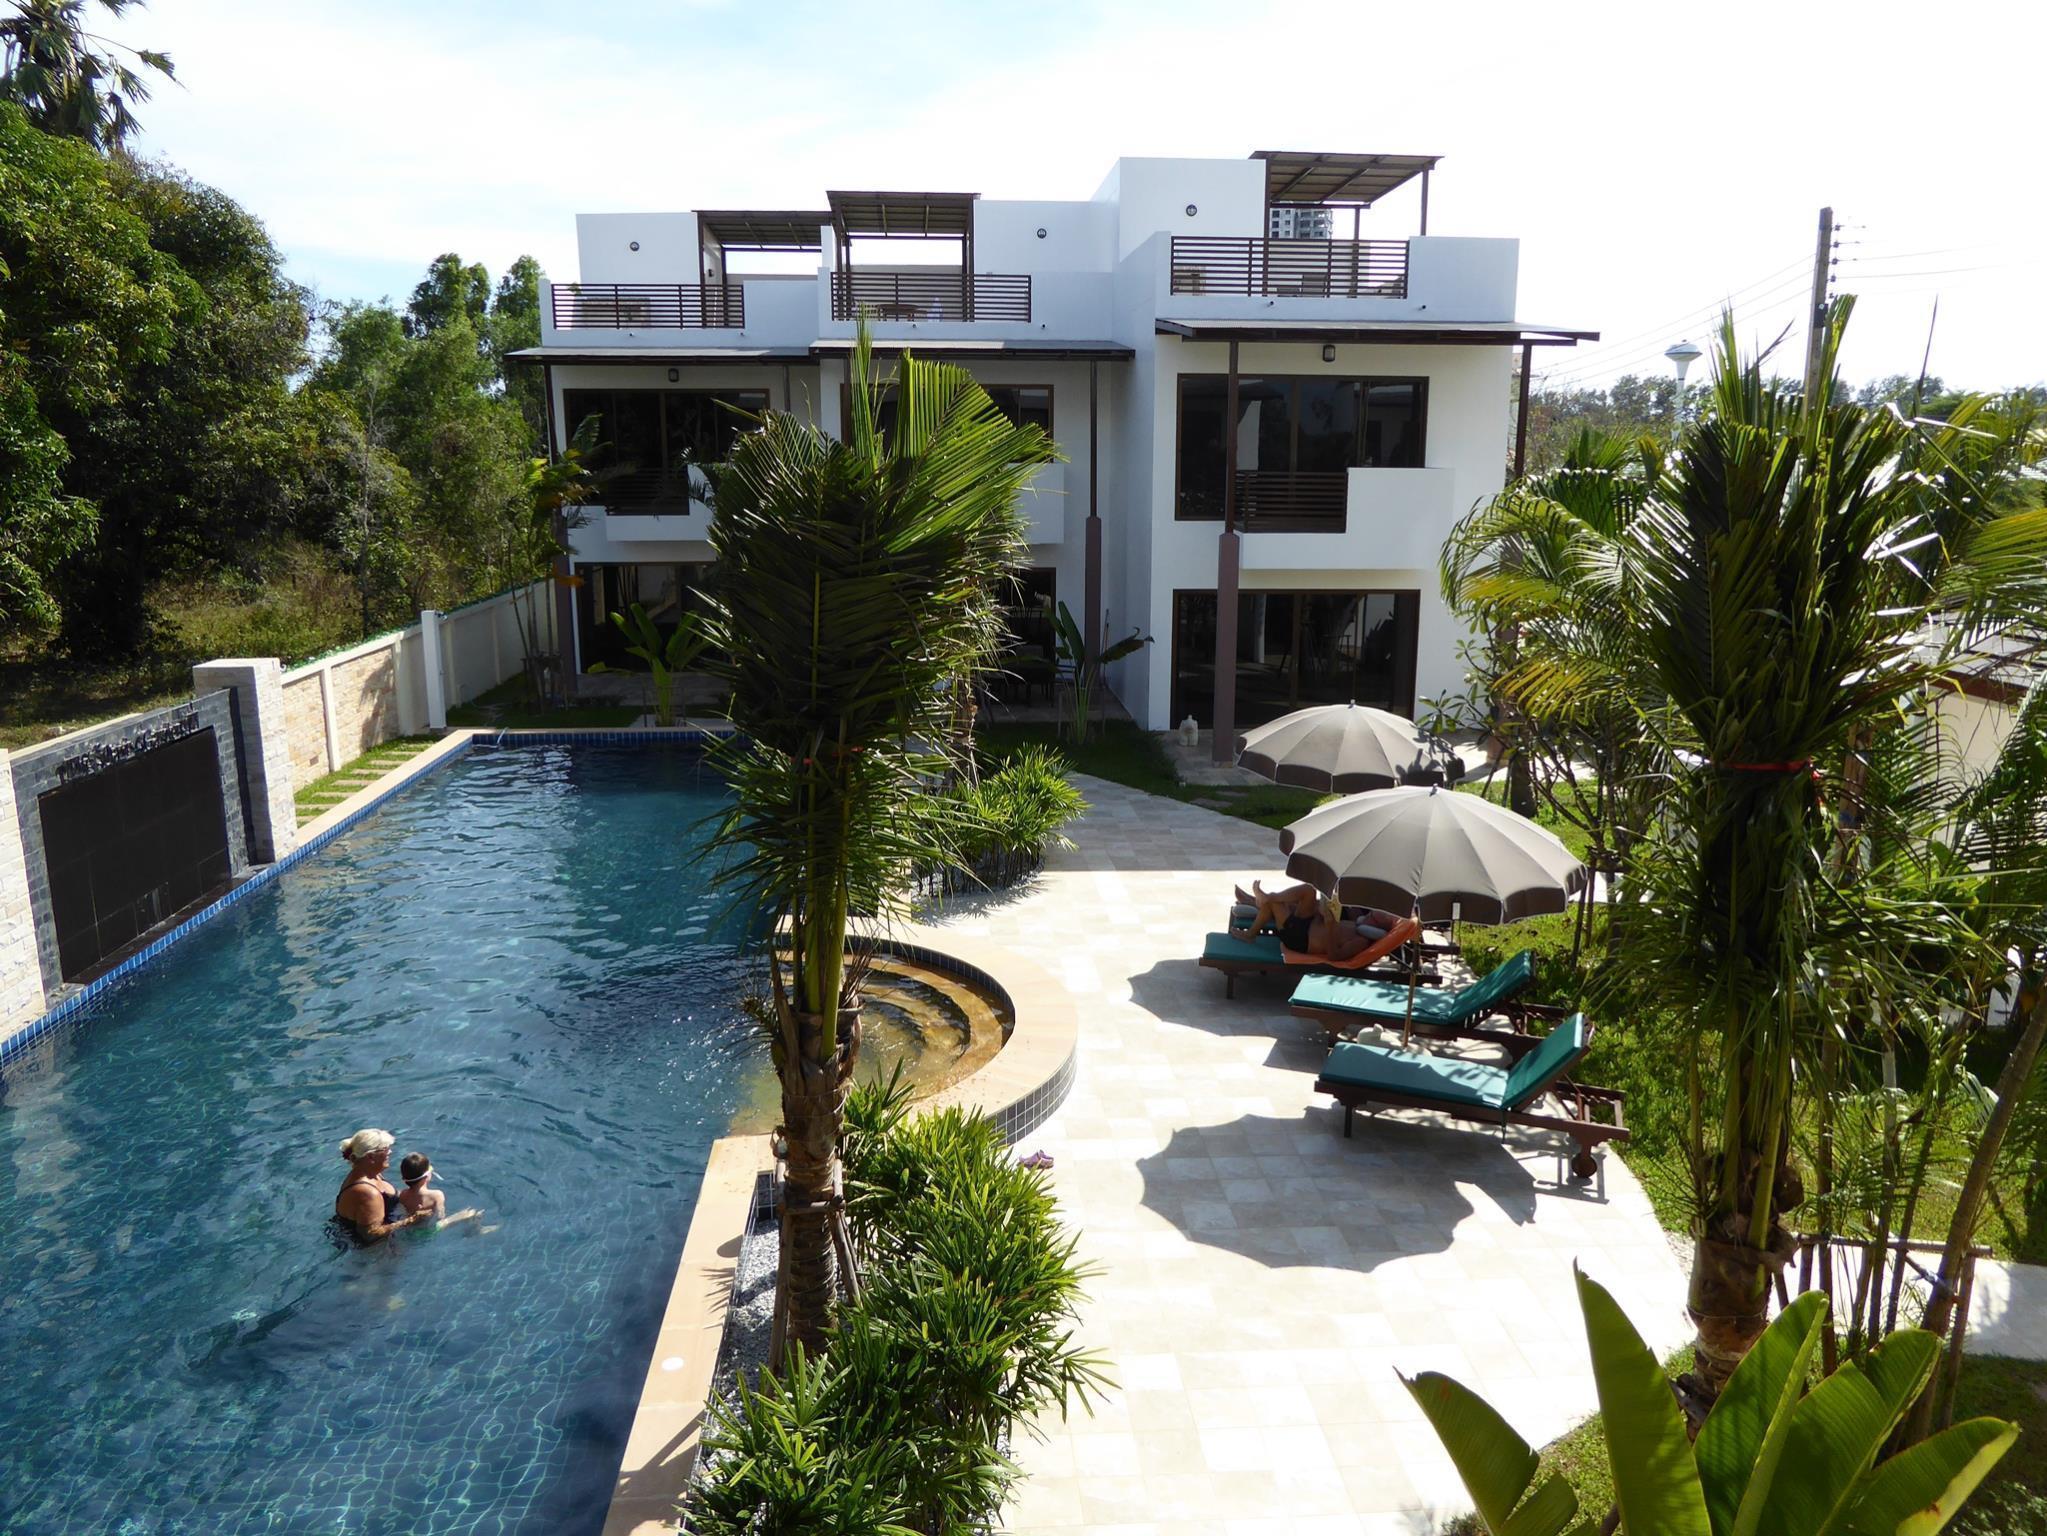 Oasis Beach House at VIP Chain Resort, 4 ห้องนอน 3 ห้องน้ำส่วนตัว ขนาด 110 ตร.ม. – หาดระยอง